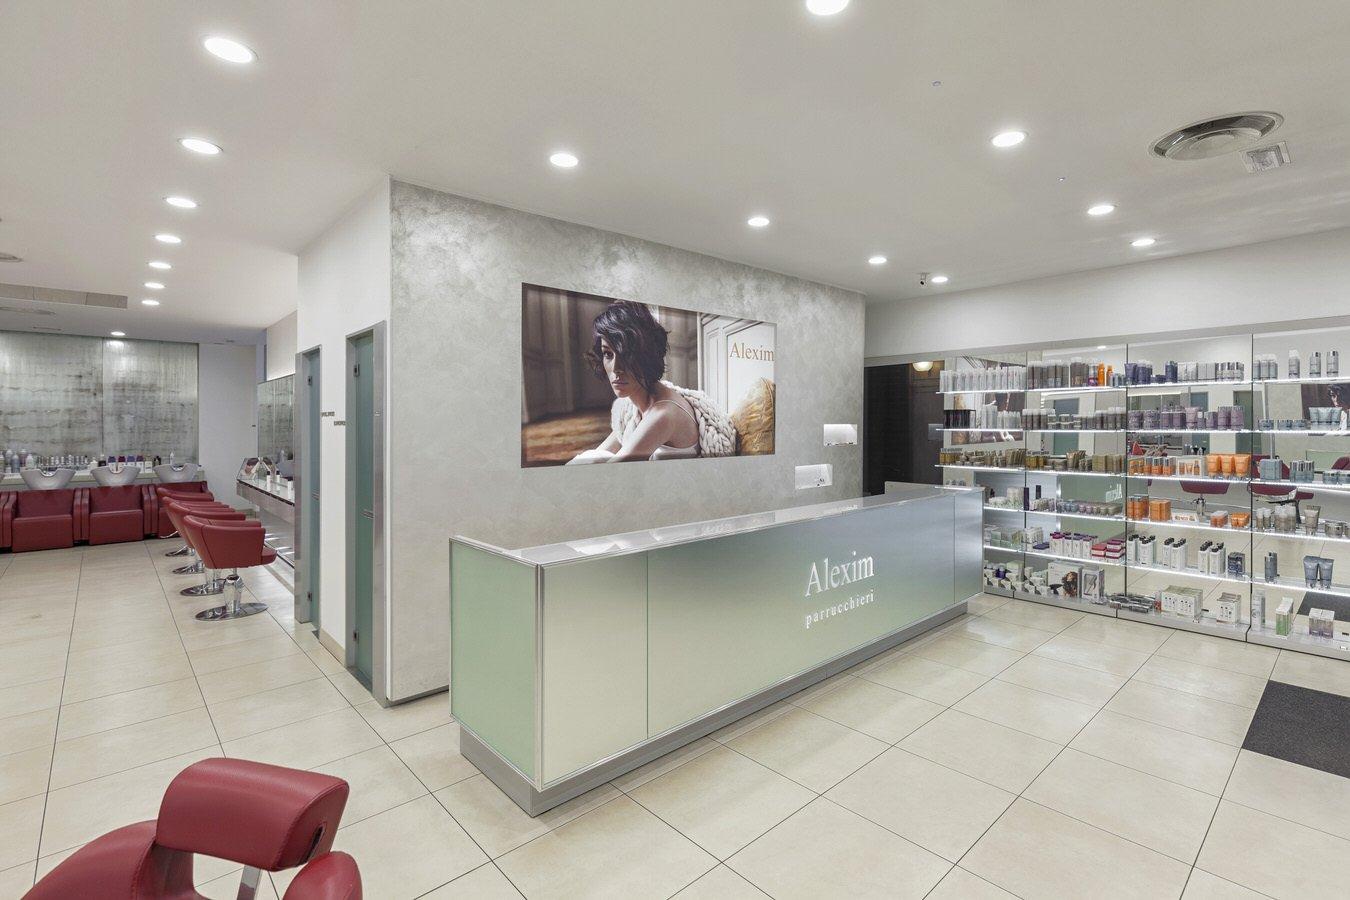 parrucchiere-alexim-via-giuseppe-mazzini-16-milano-ingresso